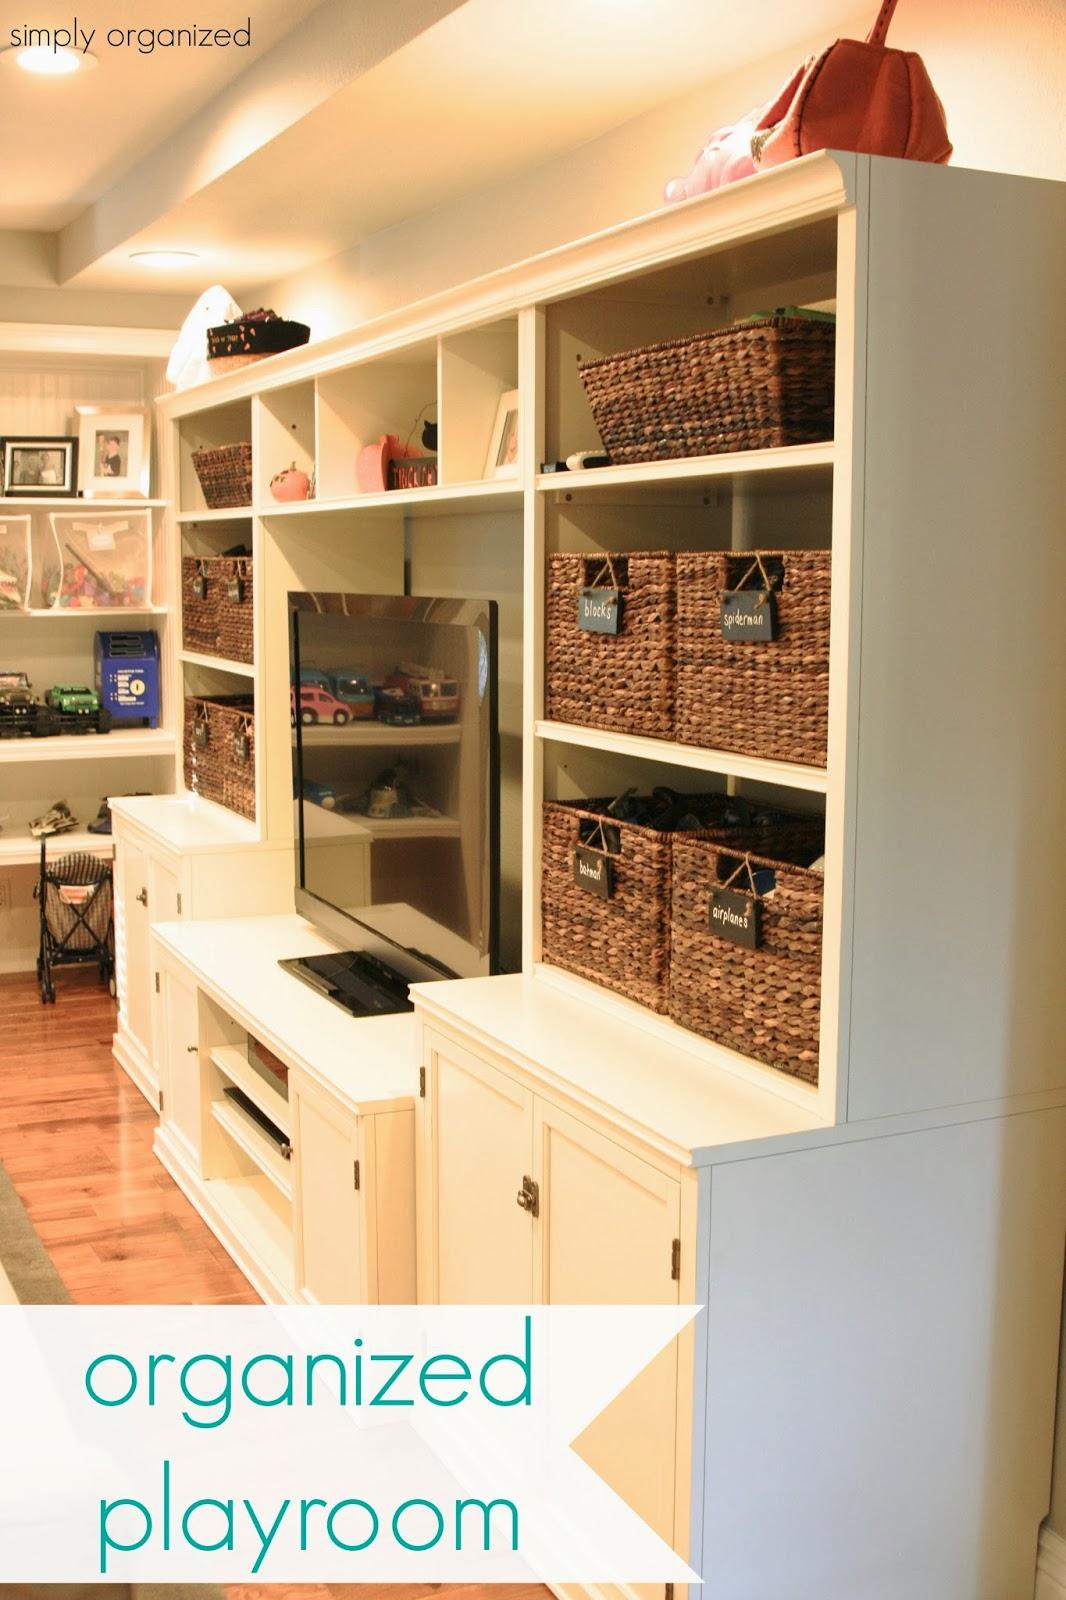 Playroom: Organized Playroom